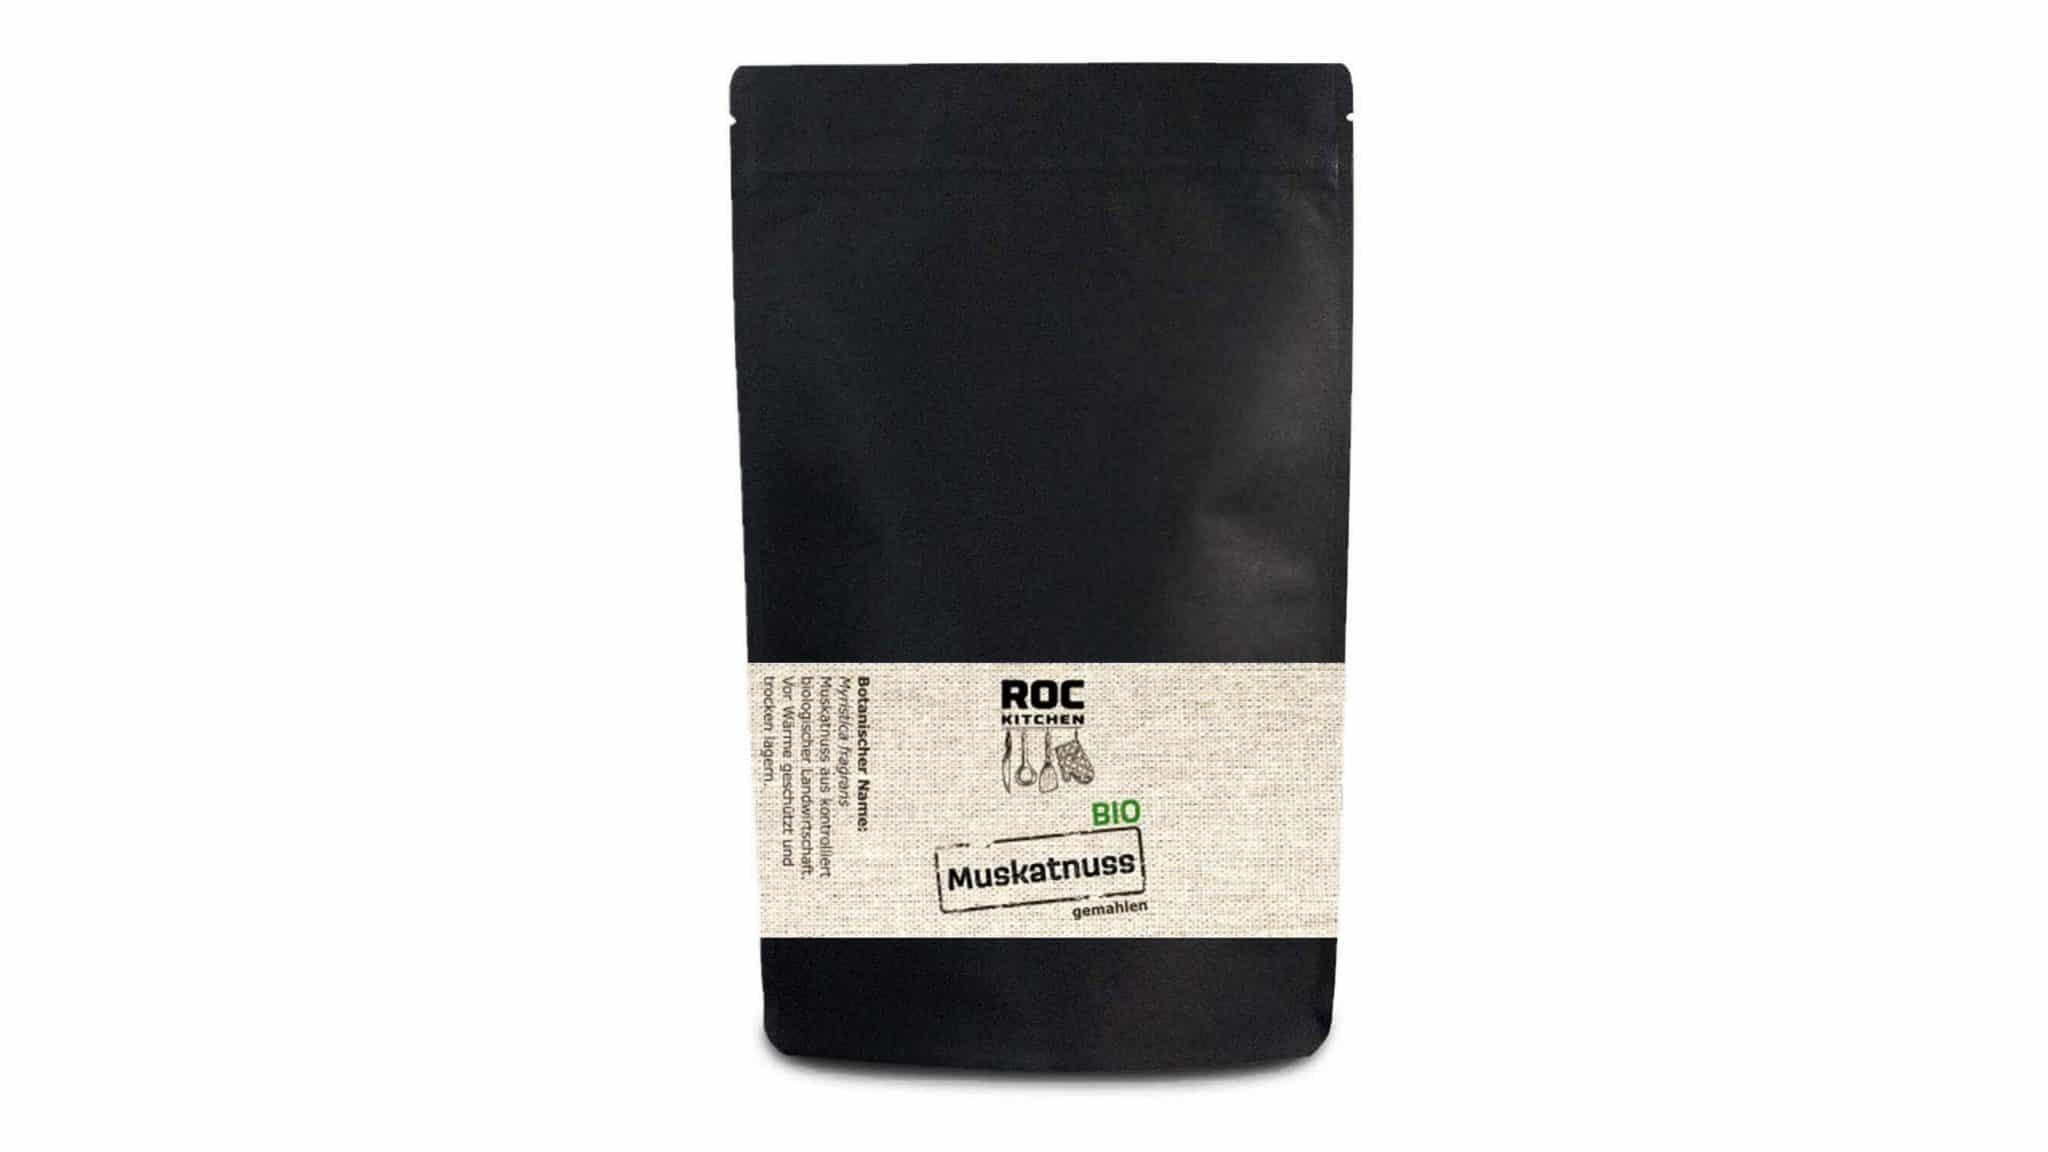 ROC-Kitchen Bio Muskatnuss